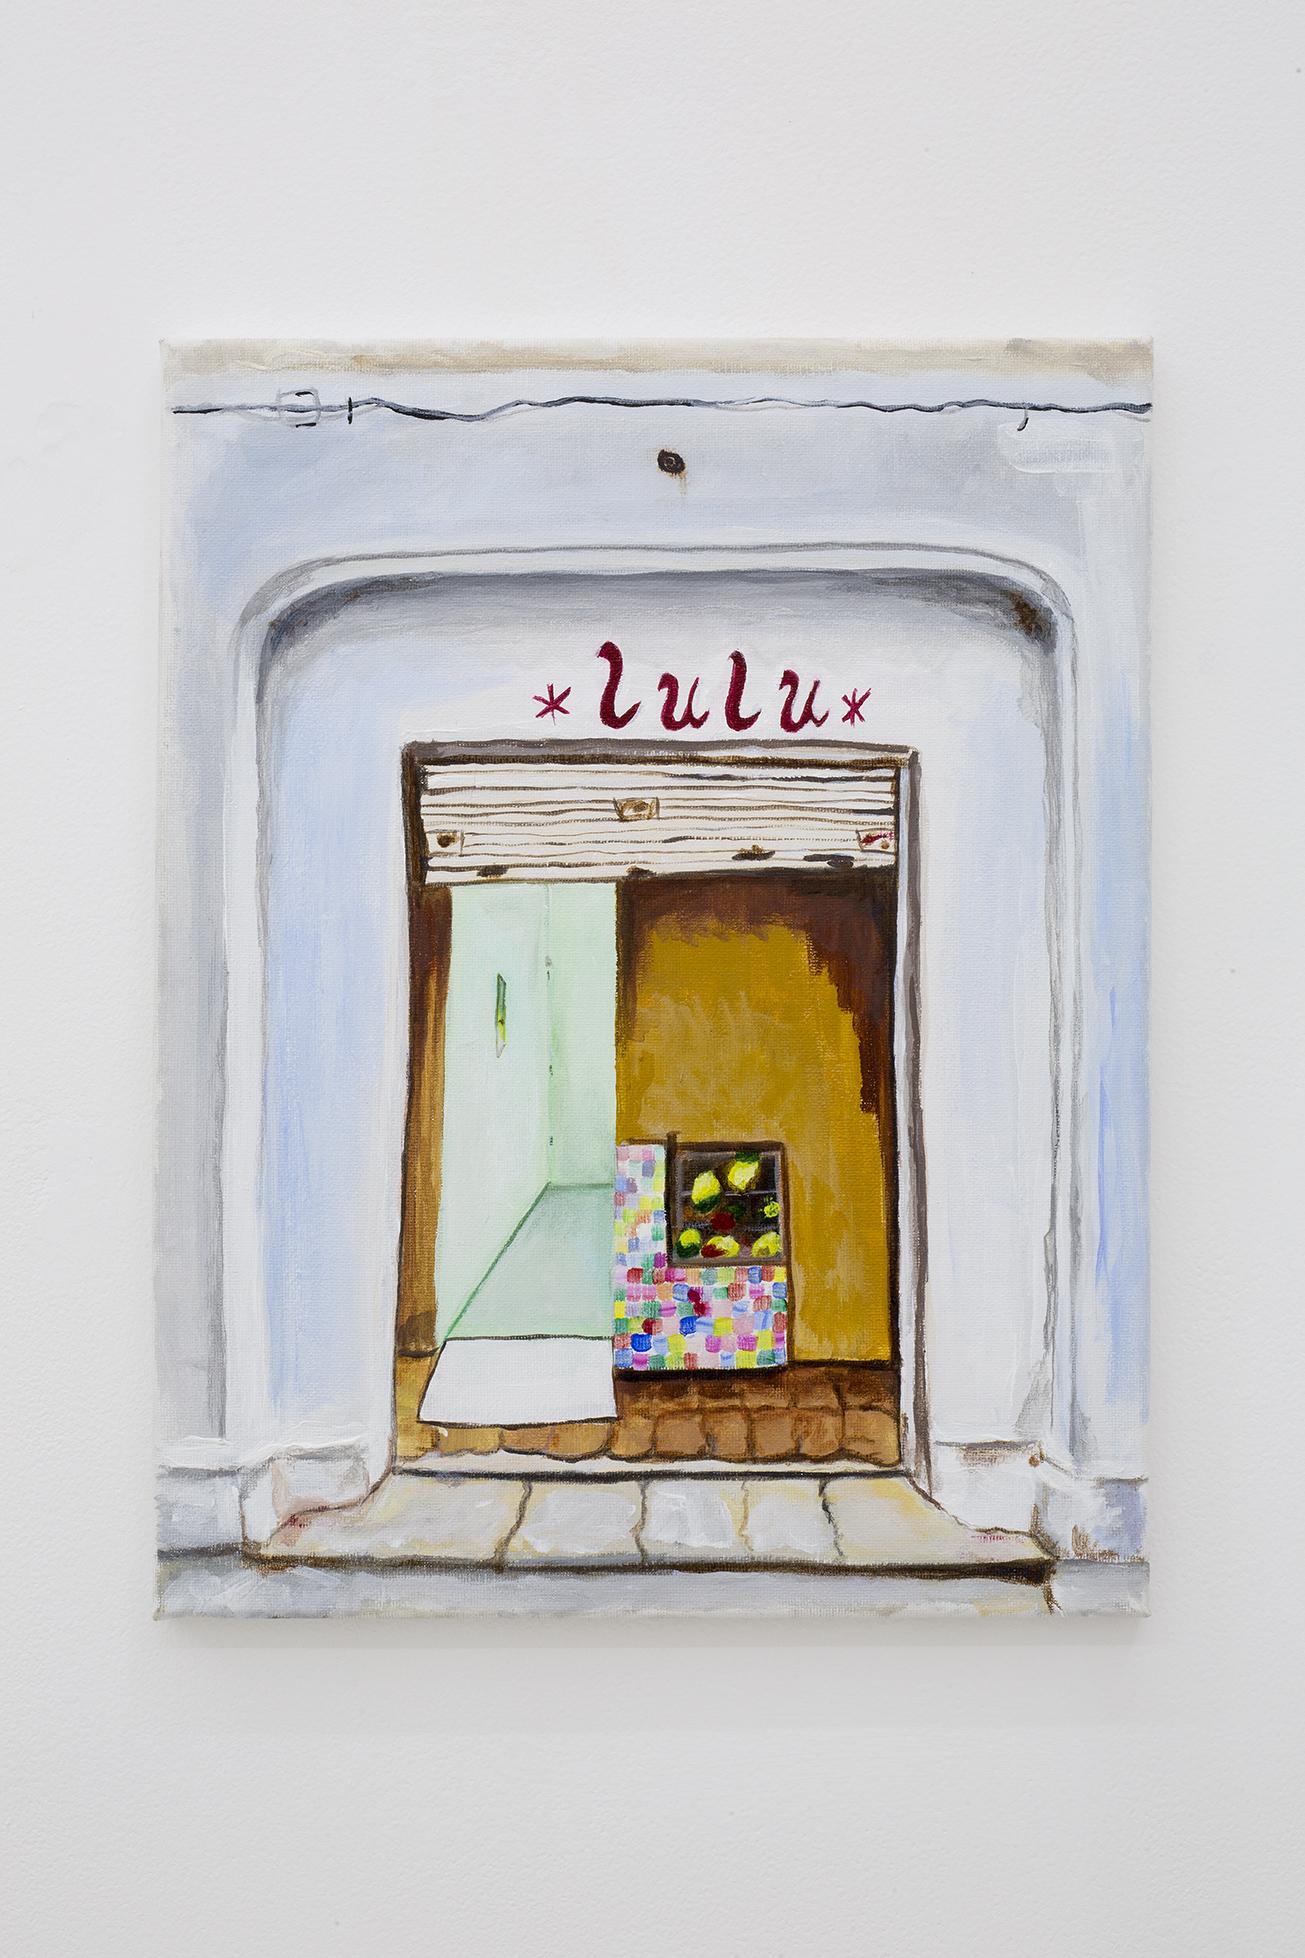 Shana Sharp, Lulu, 2017. Acrylic on canvas. 11 x 14 inch (27.94 x 35.56 cm)